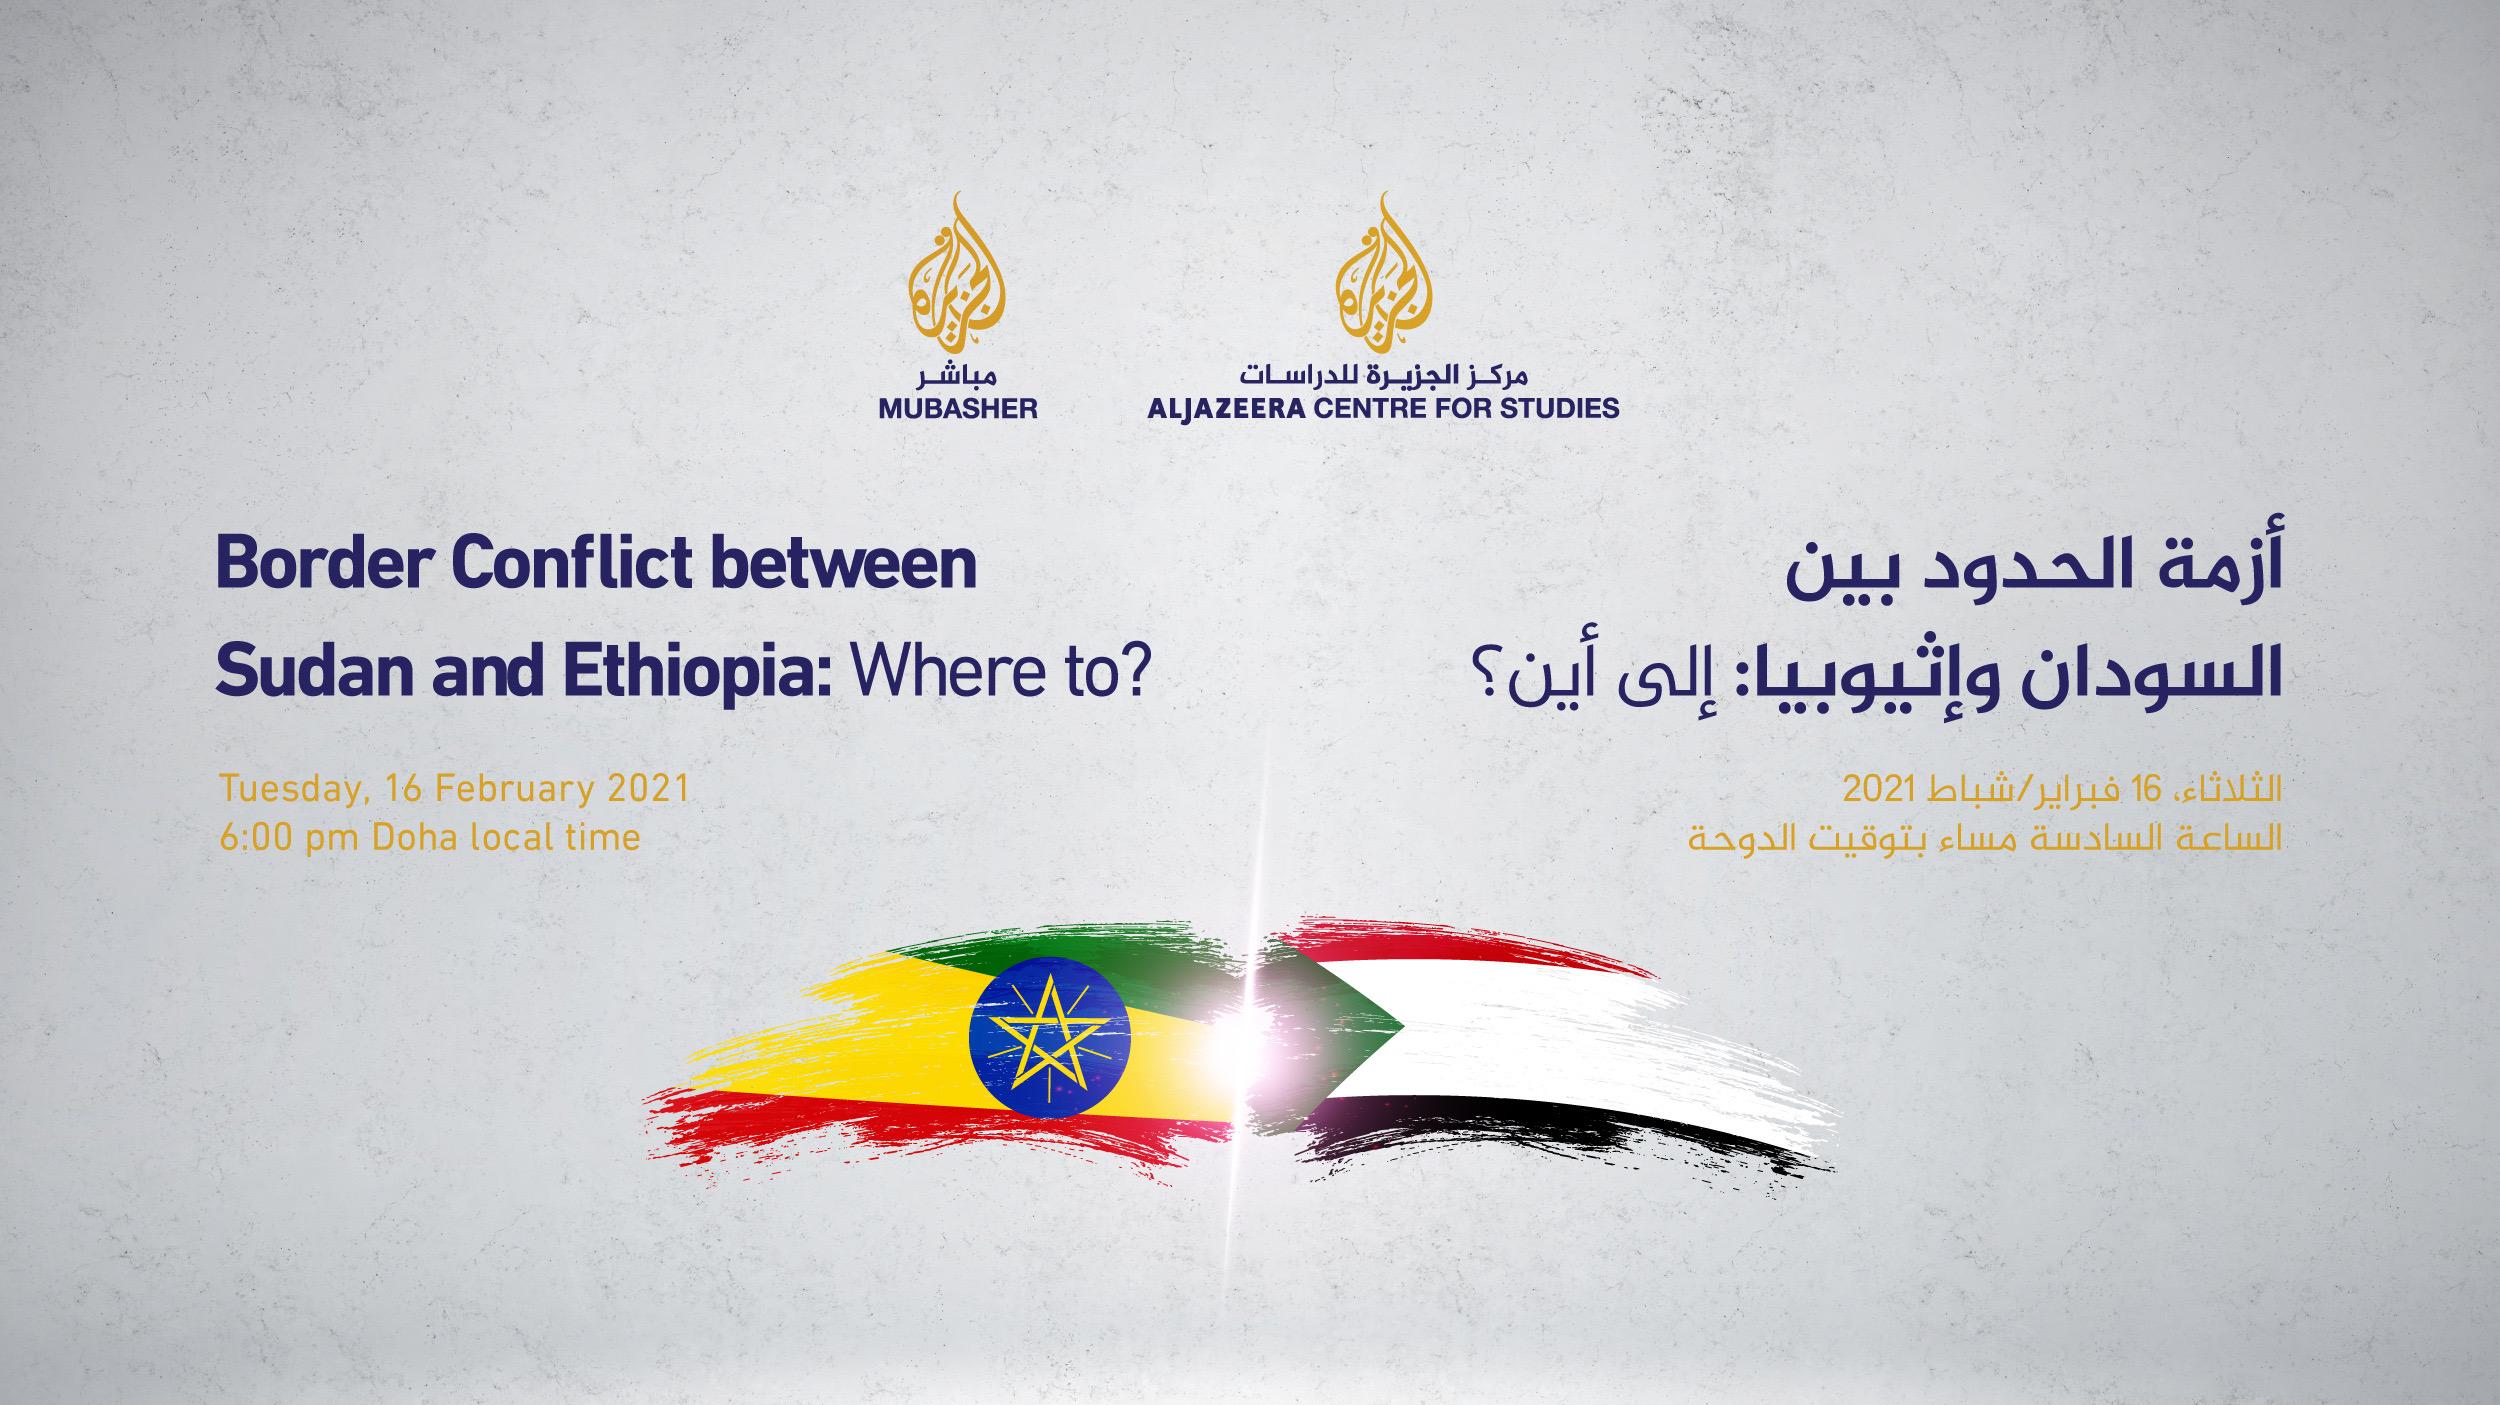 studies.aljazeera.net: AJCS explores the developments and trajectory of the border conflict between Sudan and Ethiopia